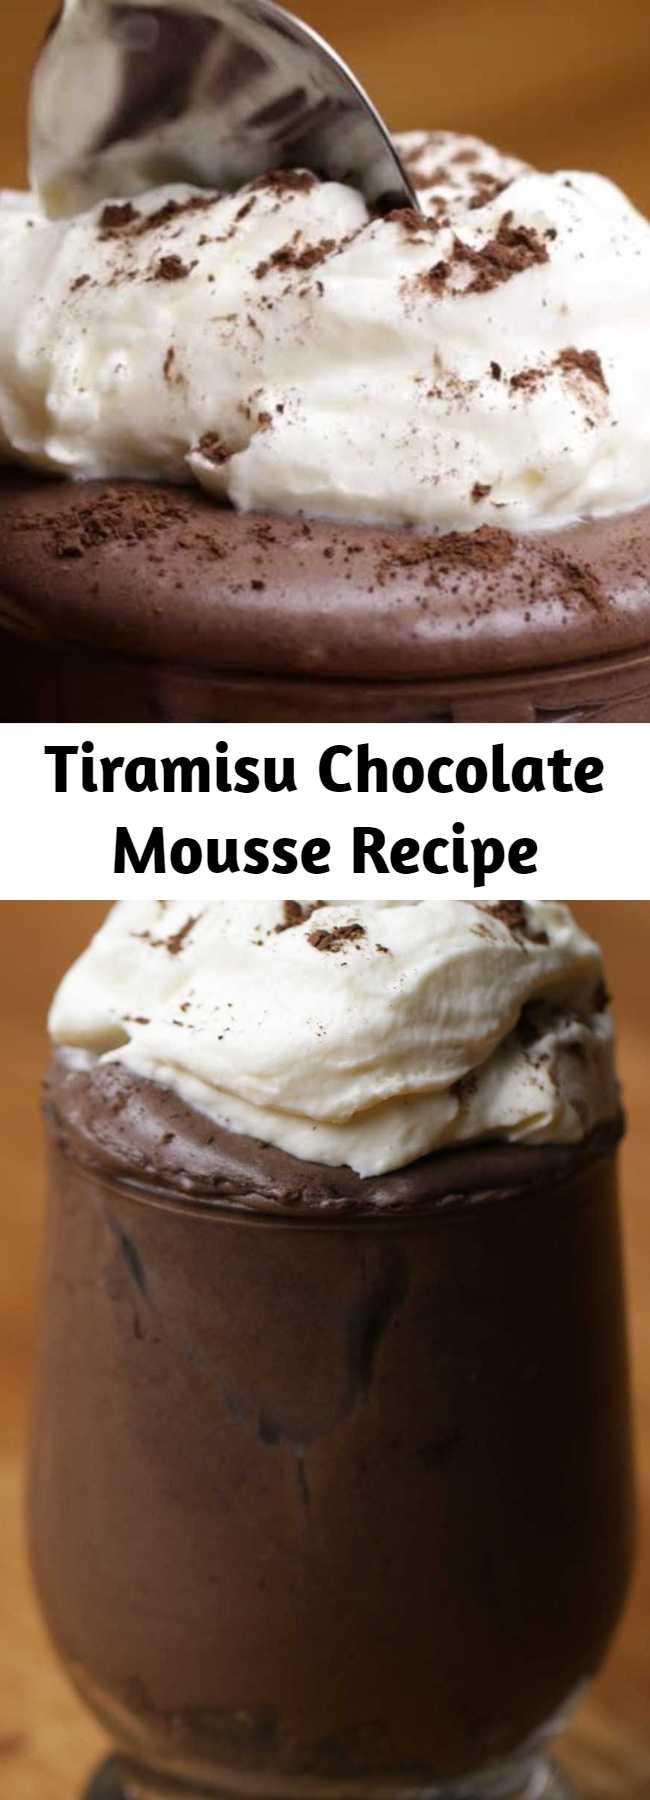 Tiramisu Chocolate Mousse Recipe - Savor your inner sweet tooth with this dreamy dessert.